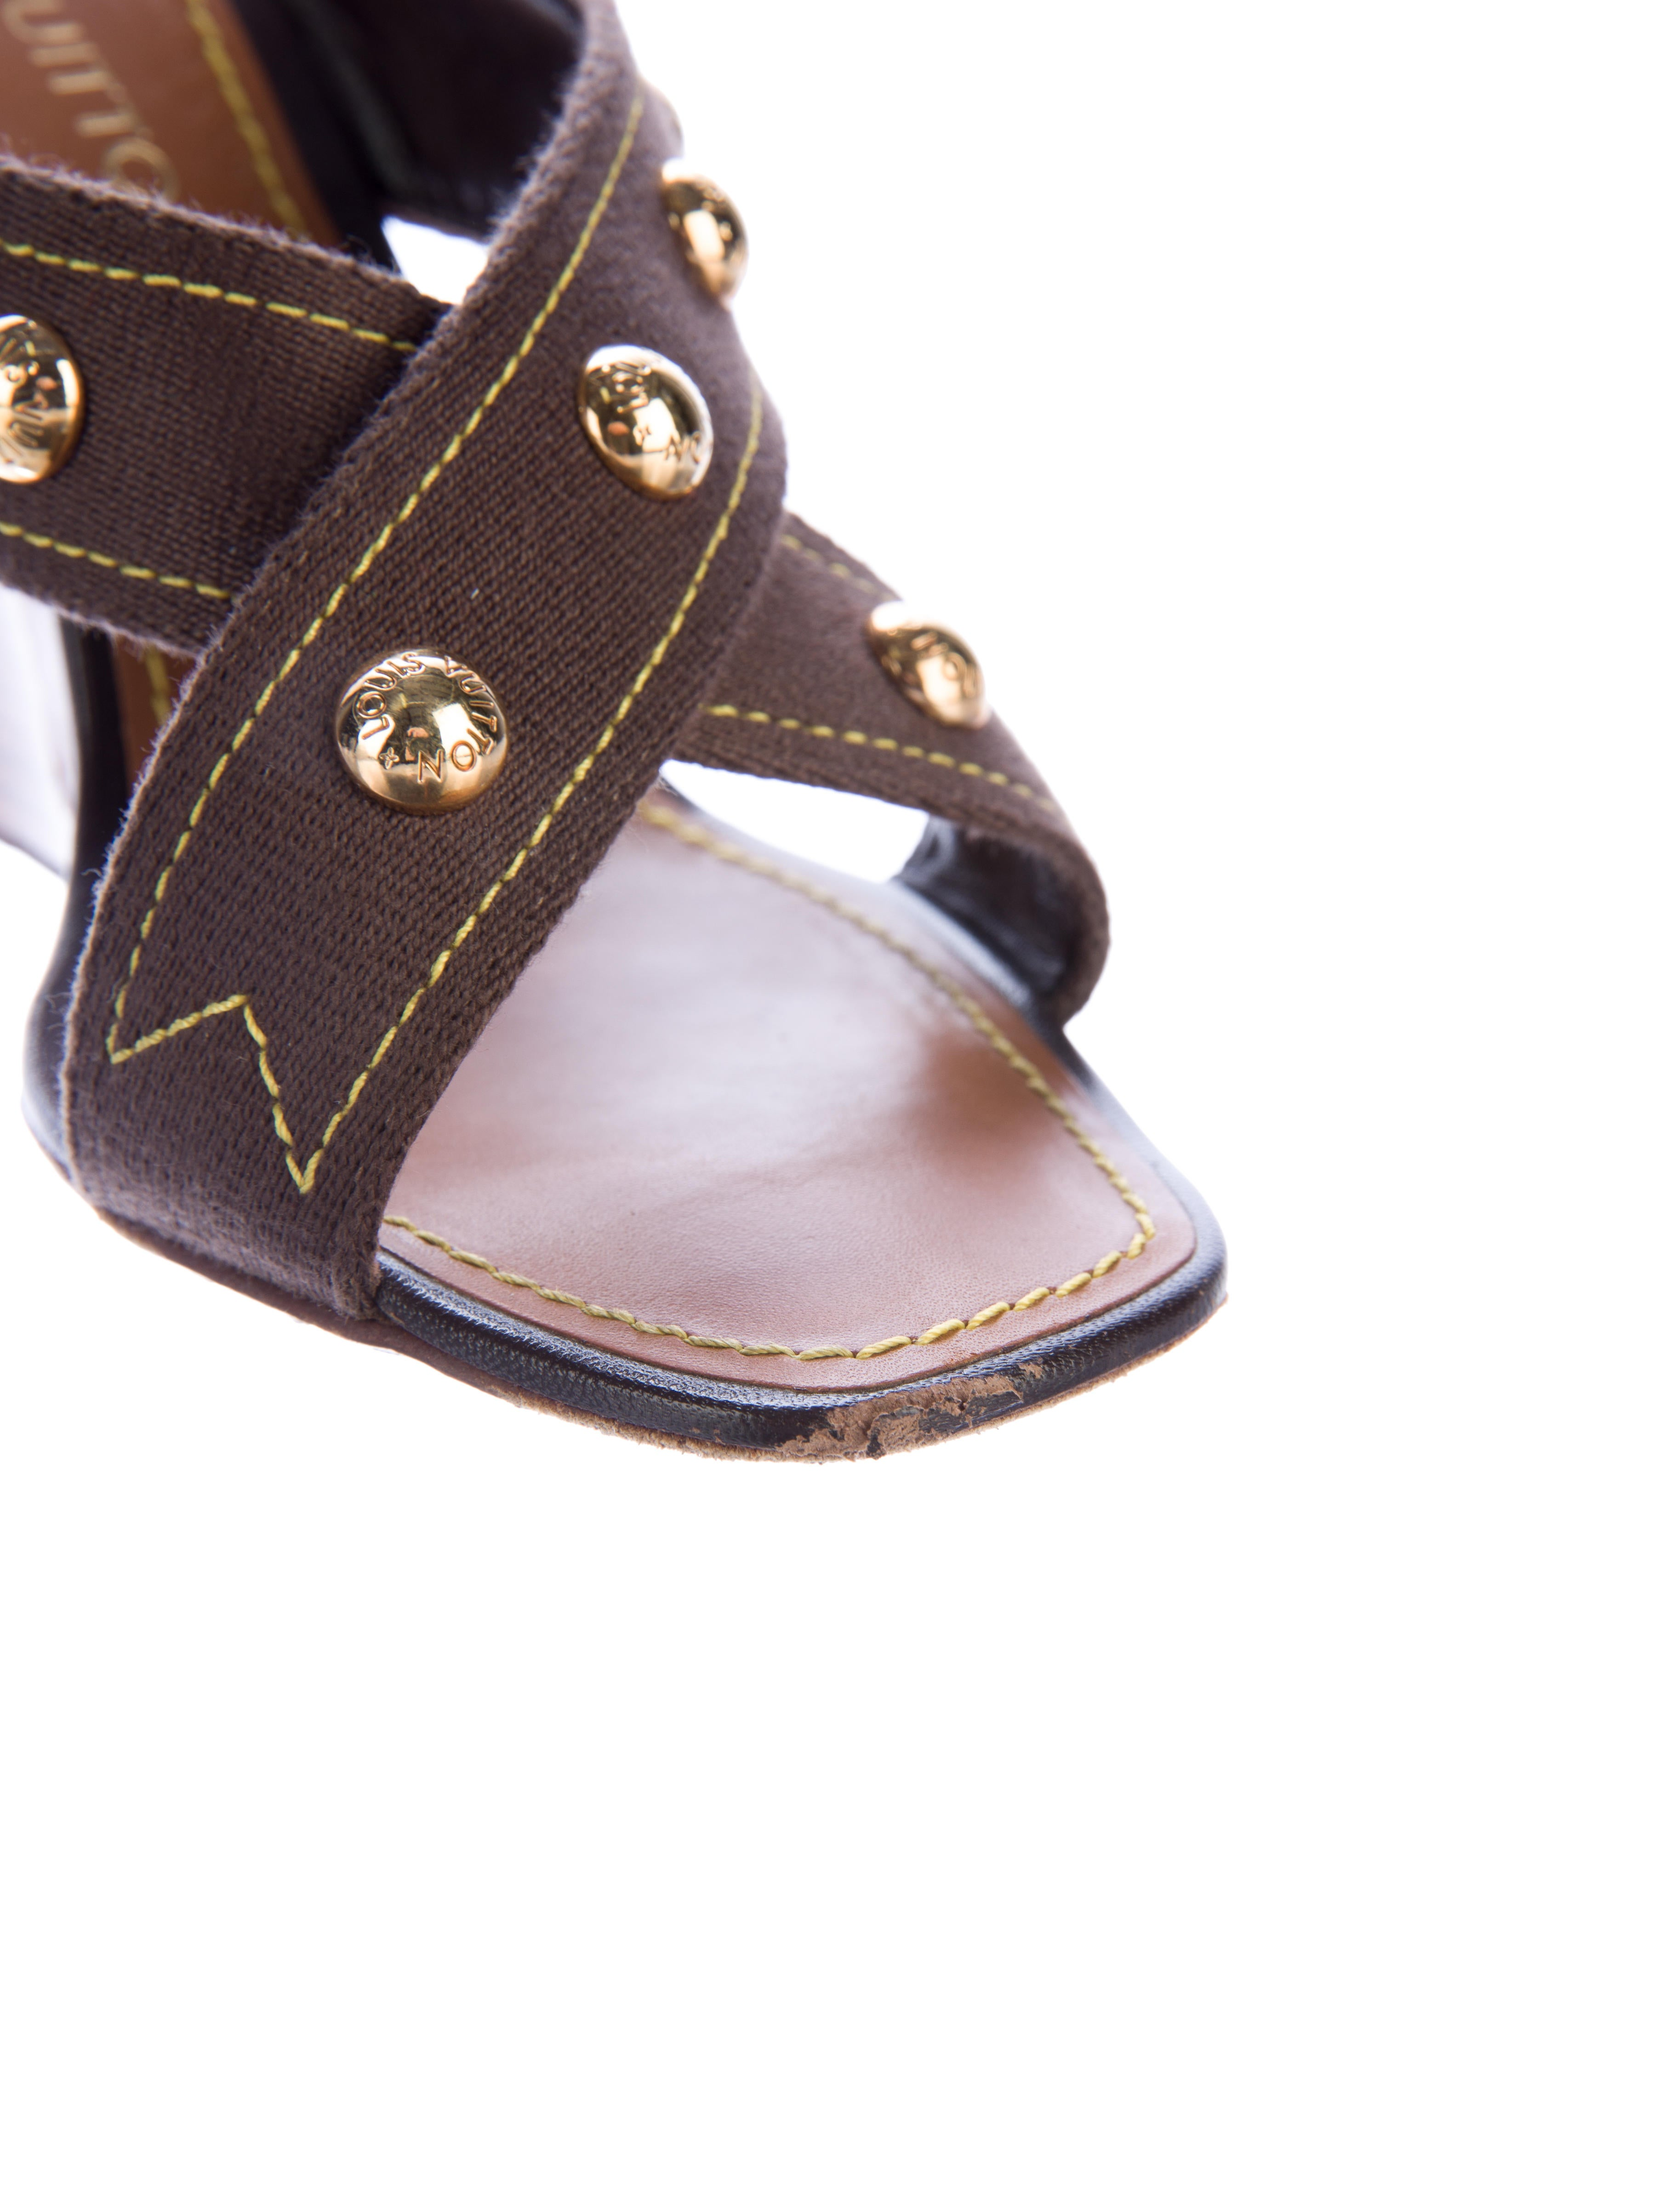 louis vuitton studded wedge sandals shoes lou106532